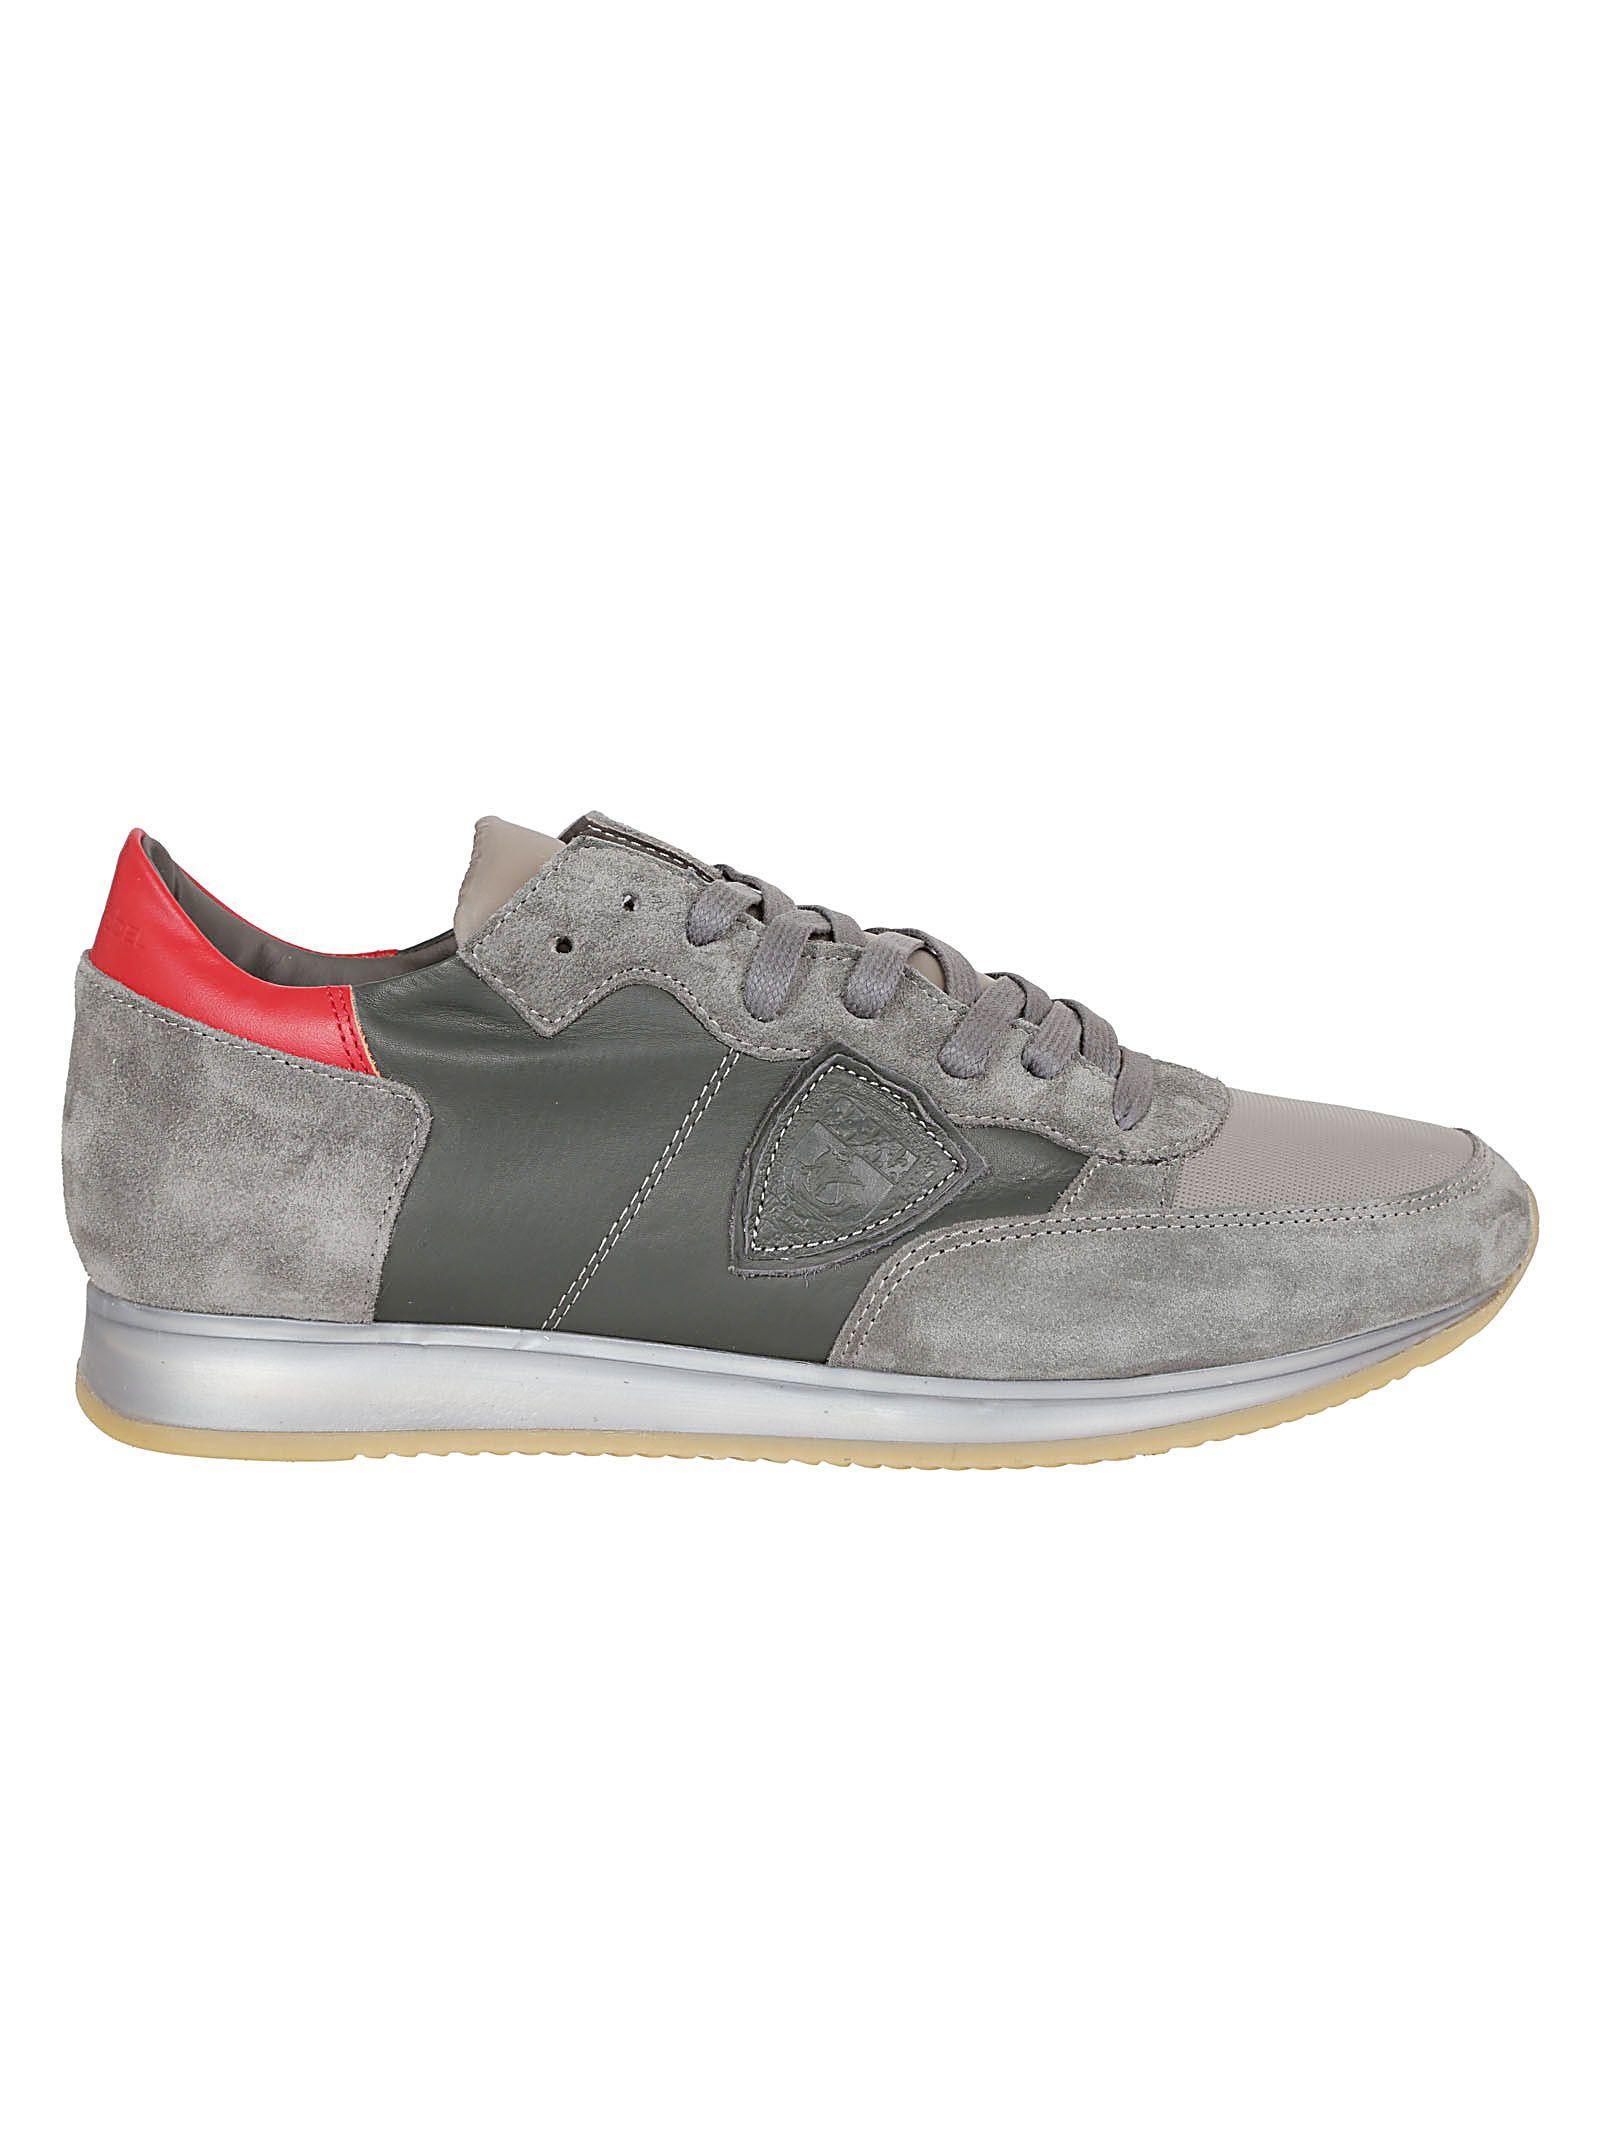 Philippe Model Tropez Sneakers In Grigio